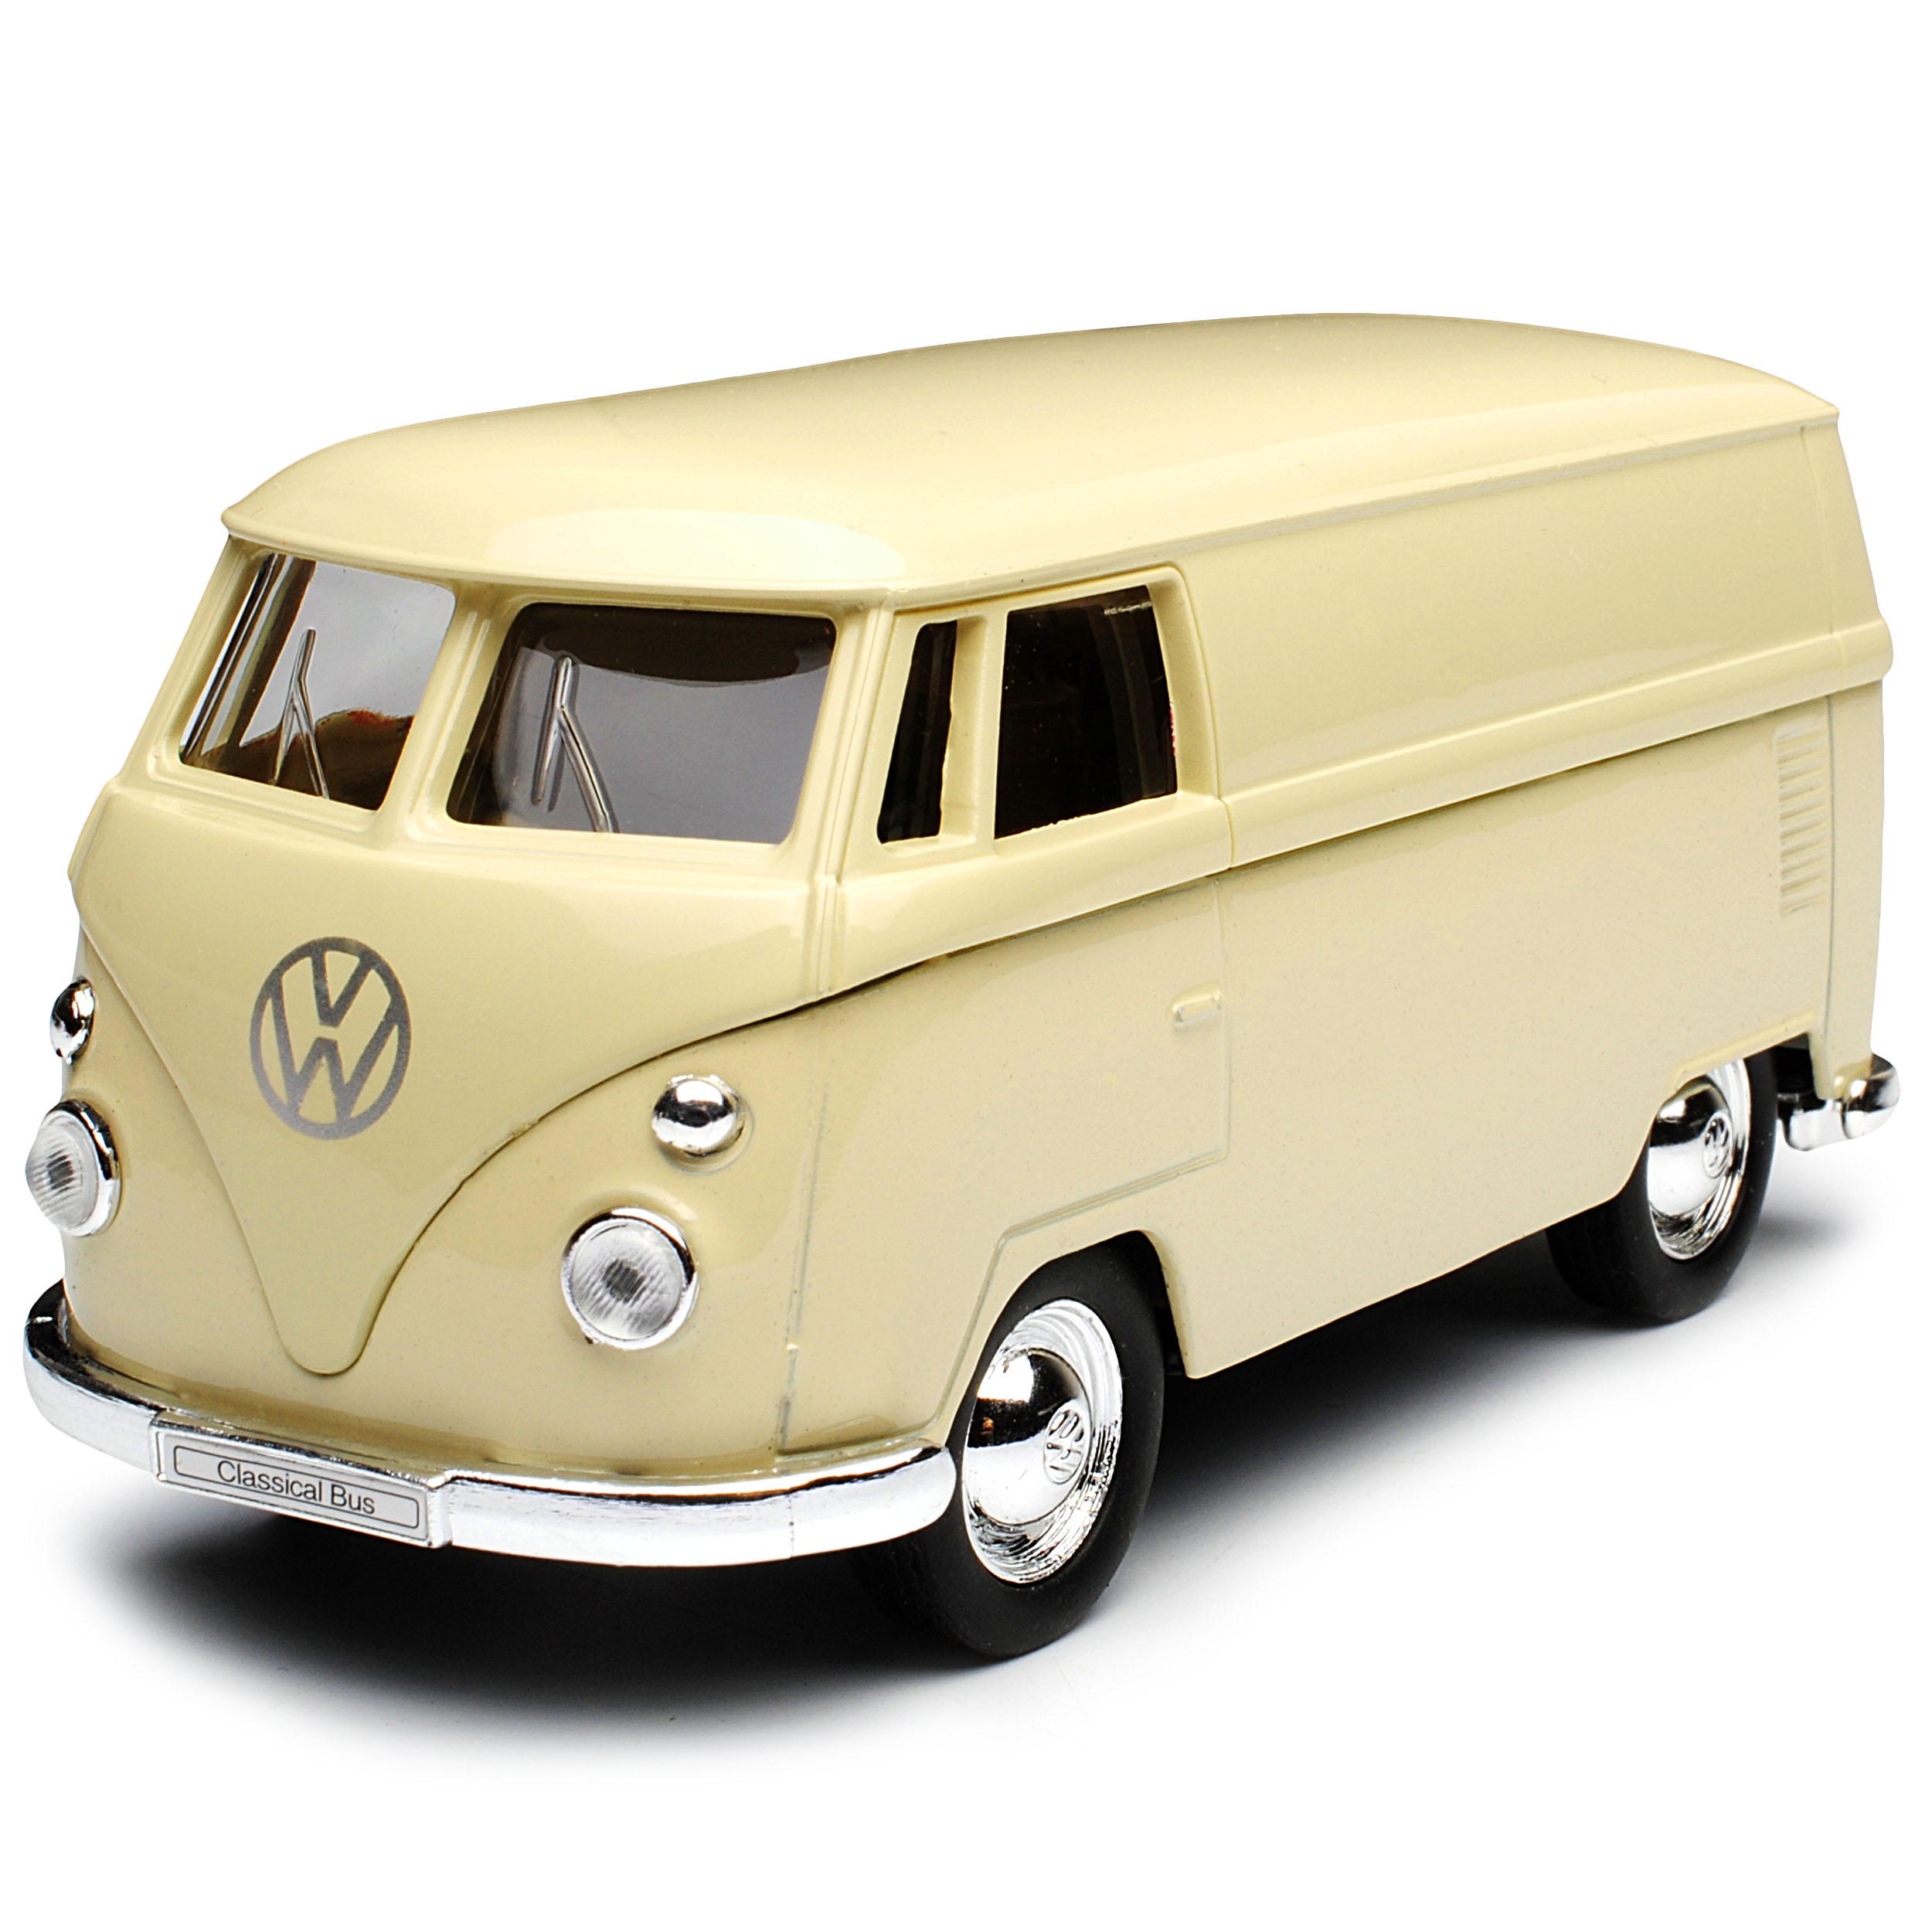 VW Volkswagen T1 Kasten Beige Bully Bus 1950-1967 ca 1//43 1//36-1//46 Welly Mode..